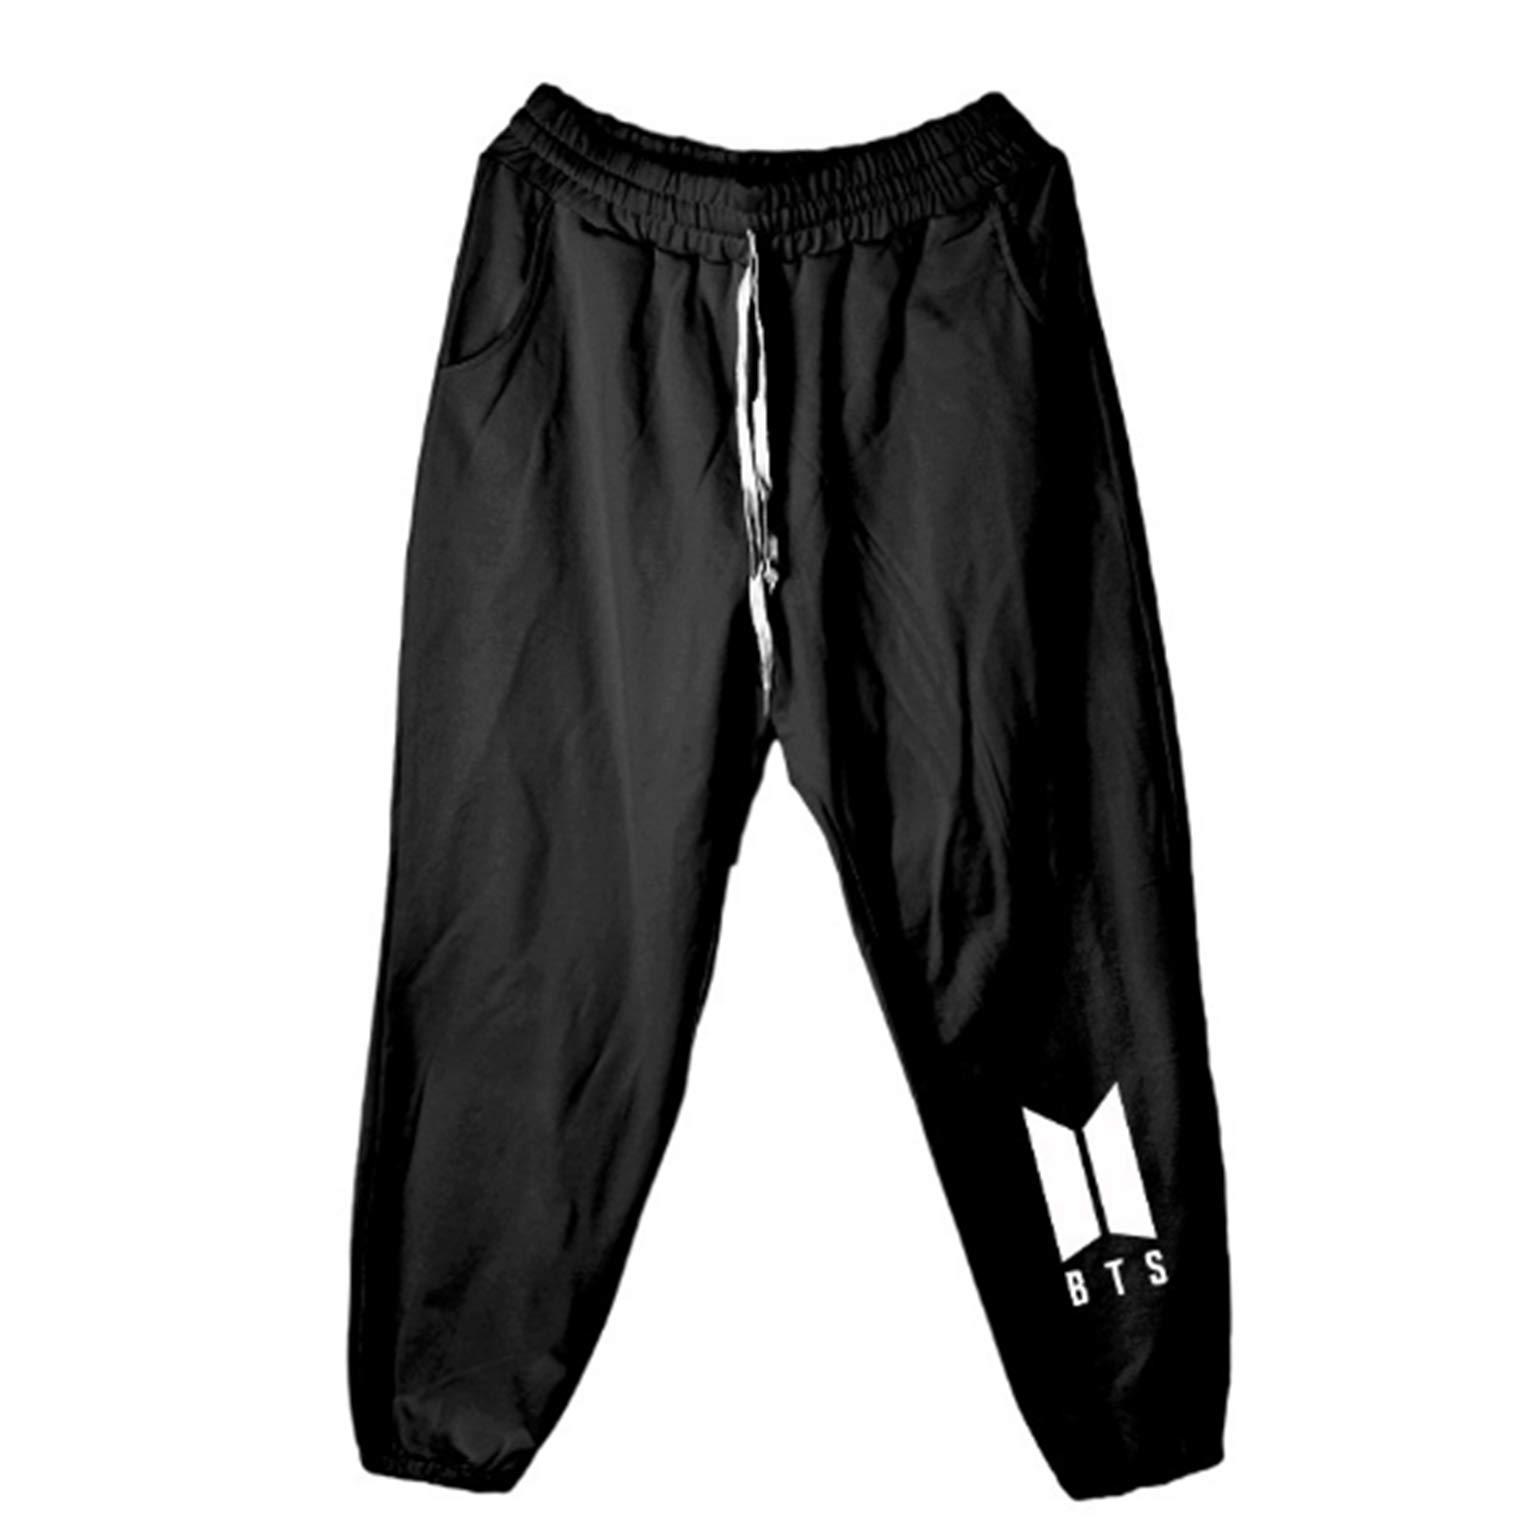 BTS Pants Nine-Point Sports Pants Girls Harajuku Style Parallel Bars Students Leisure (M, Black)